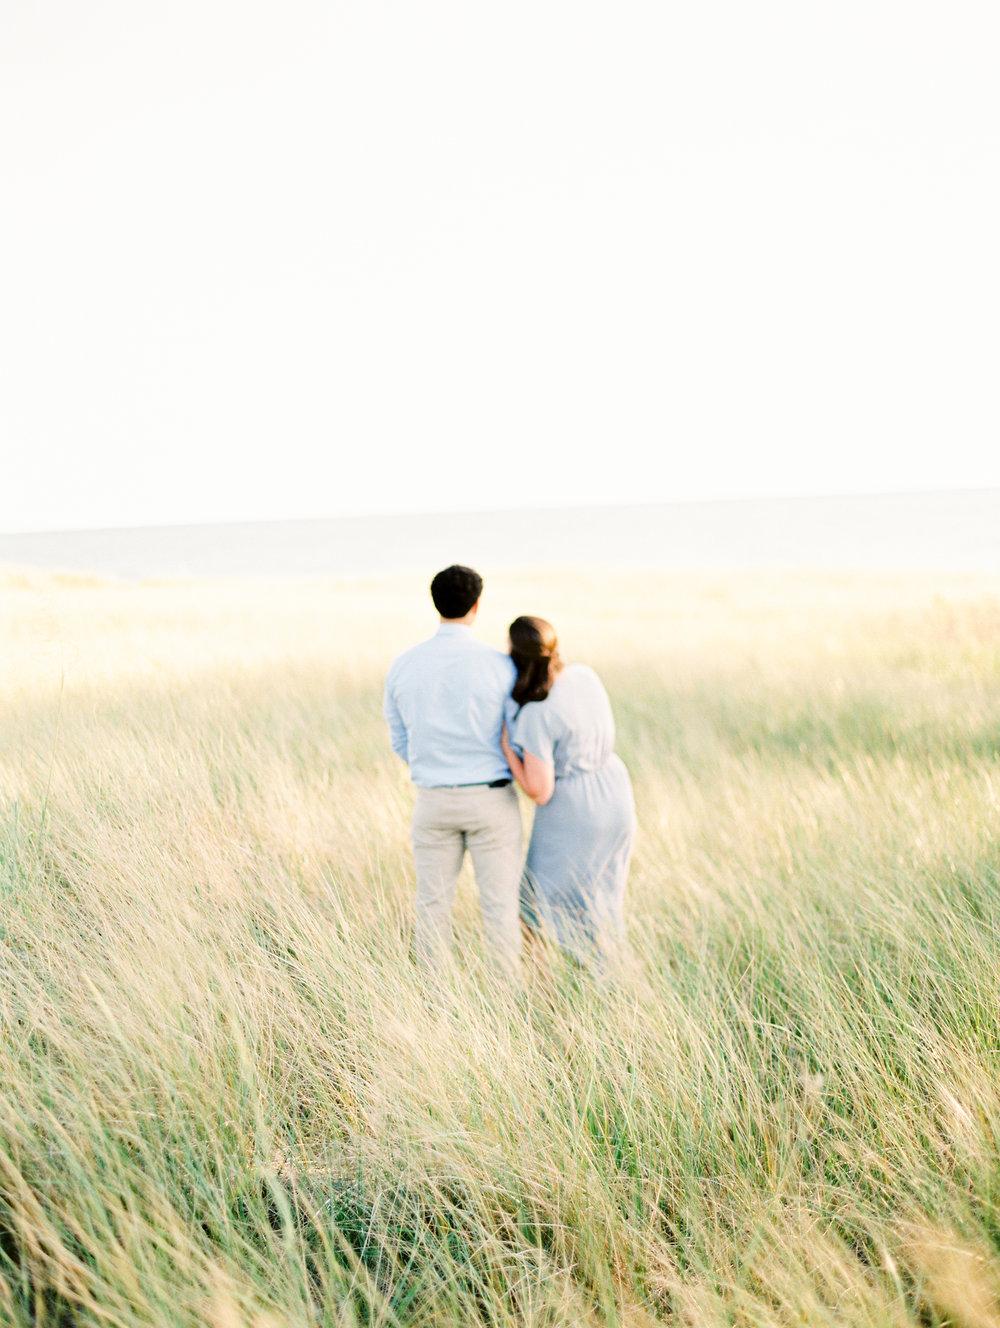 Lucie+Anthony+Engaged-79.jpg